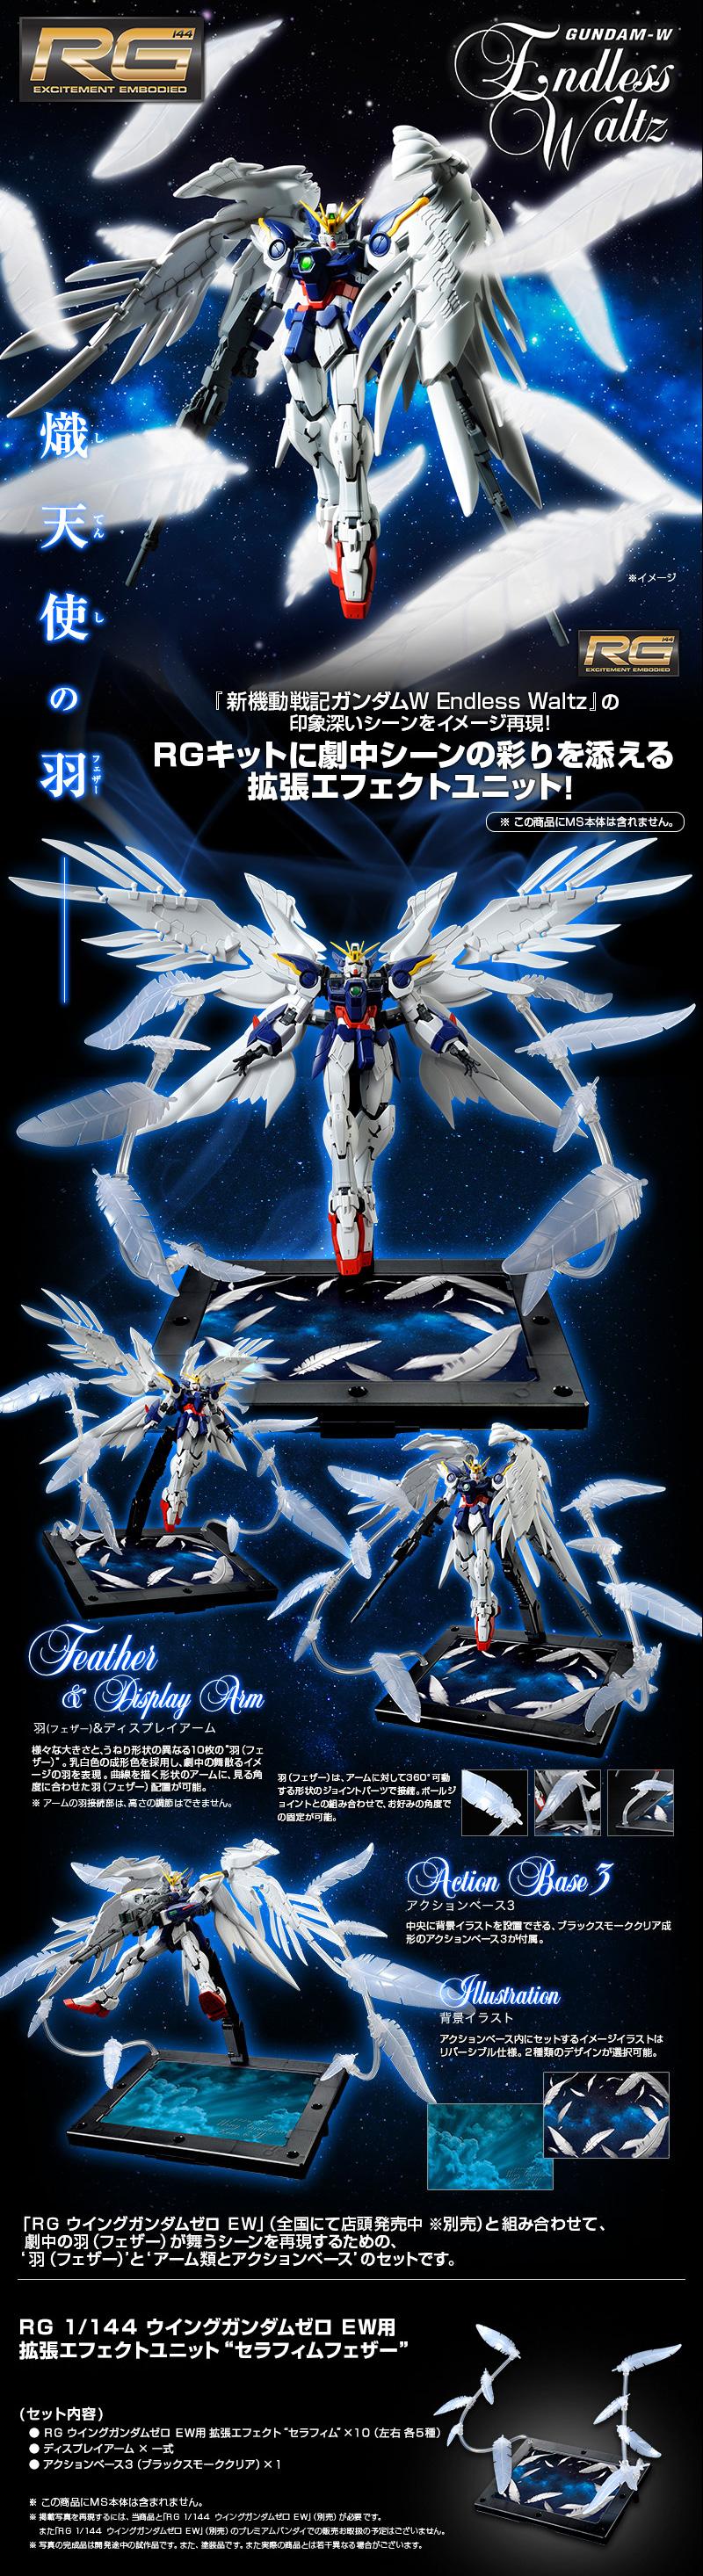 RG Seraphim Feather Expansion Set Details